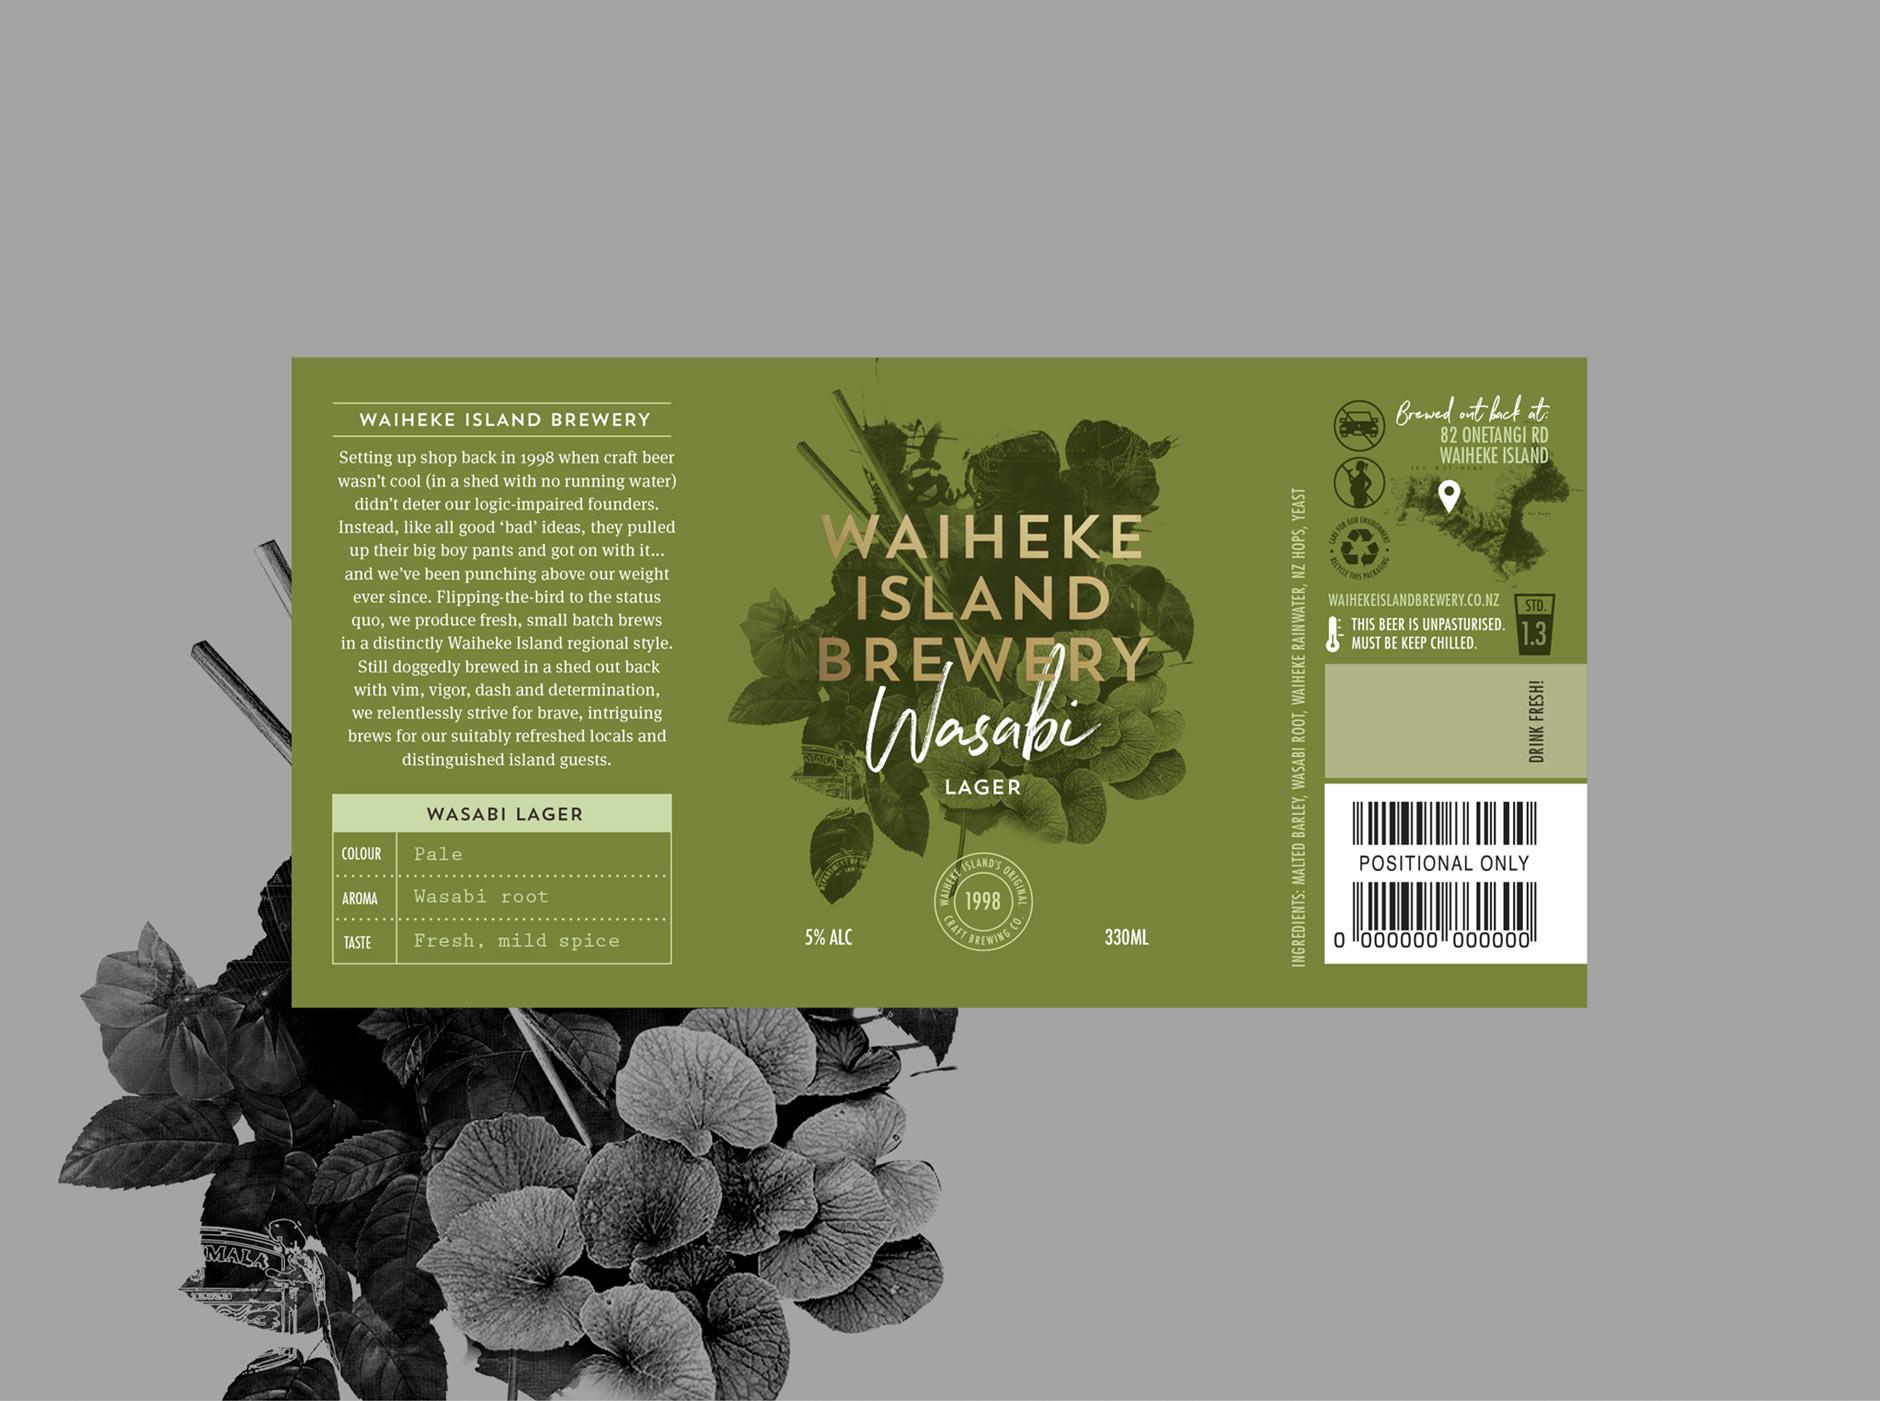 Waiheke Island Brewery Wasabi Lager